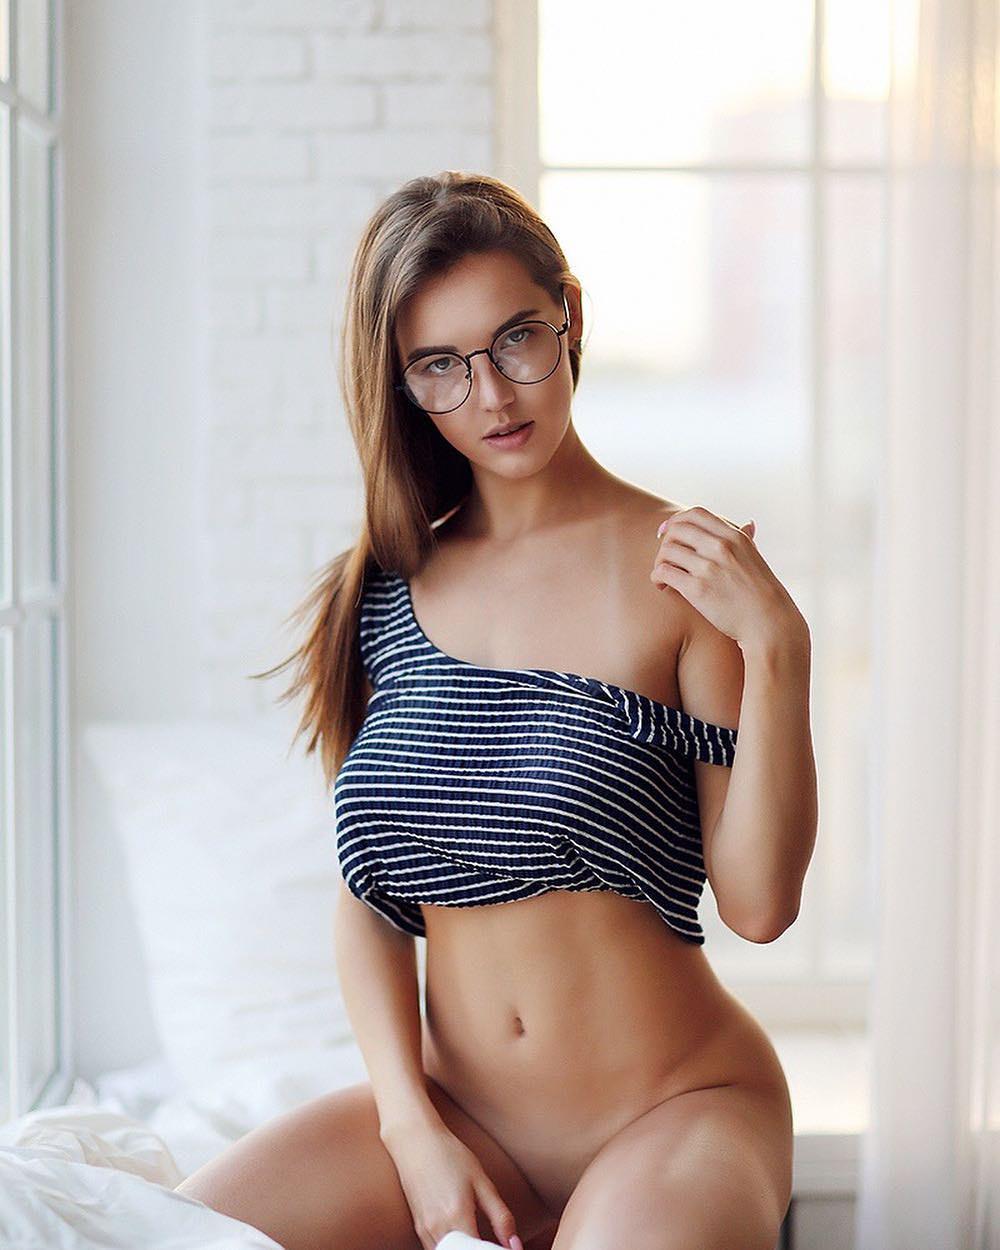 Elena von avalor porn